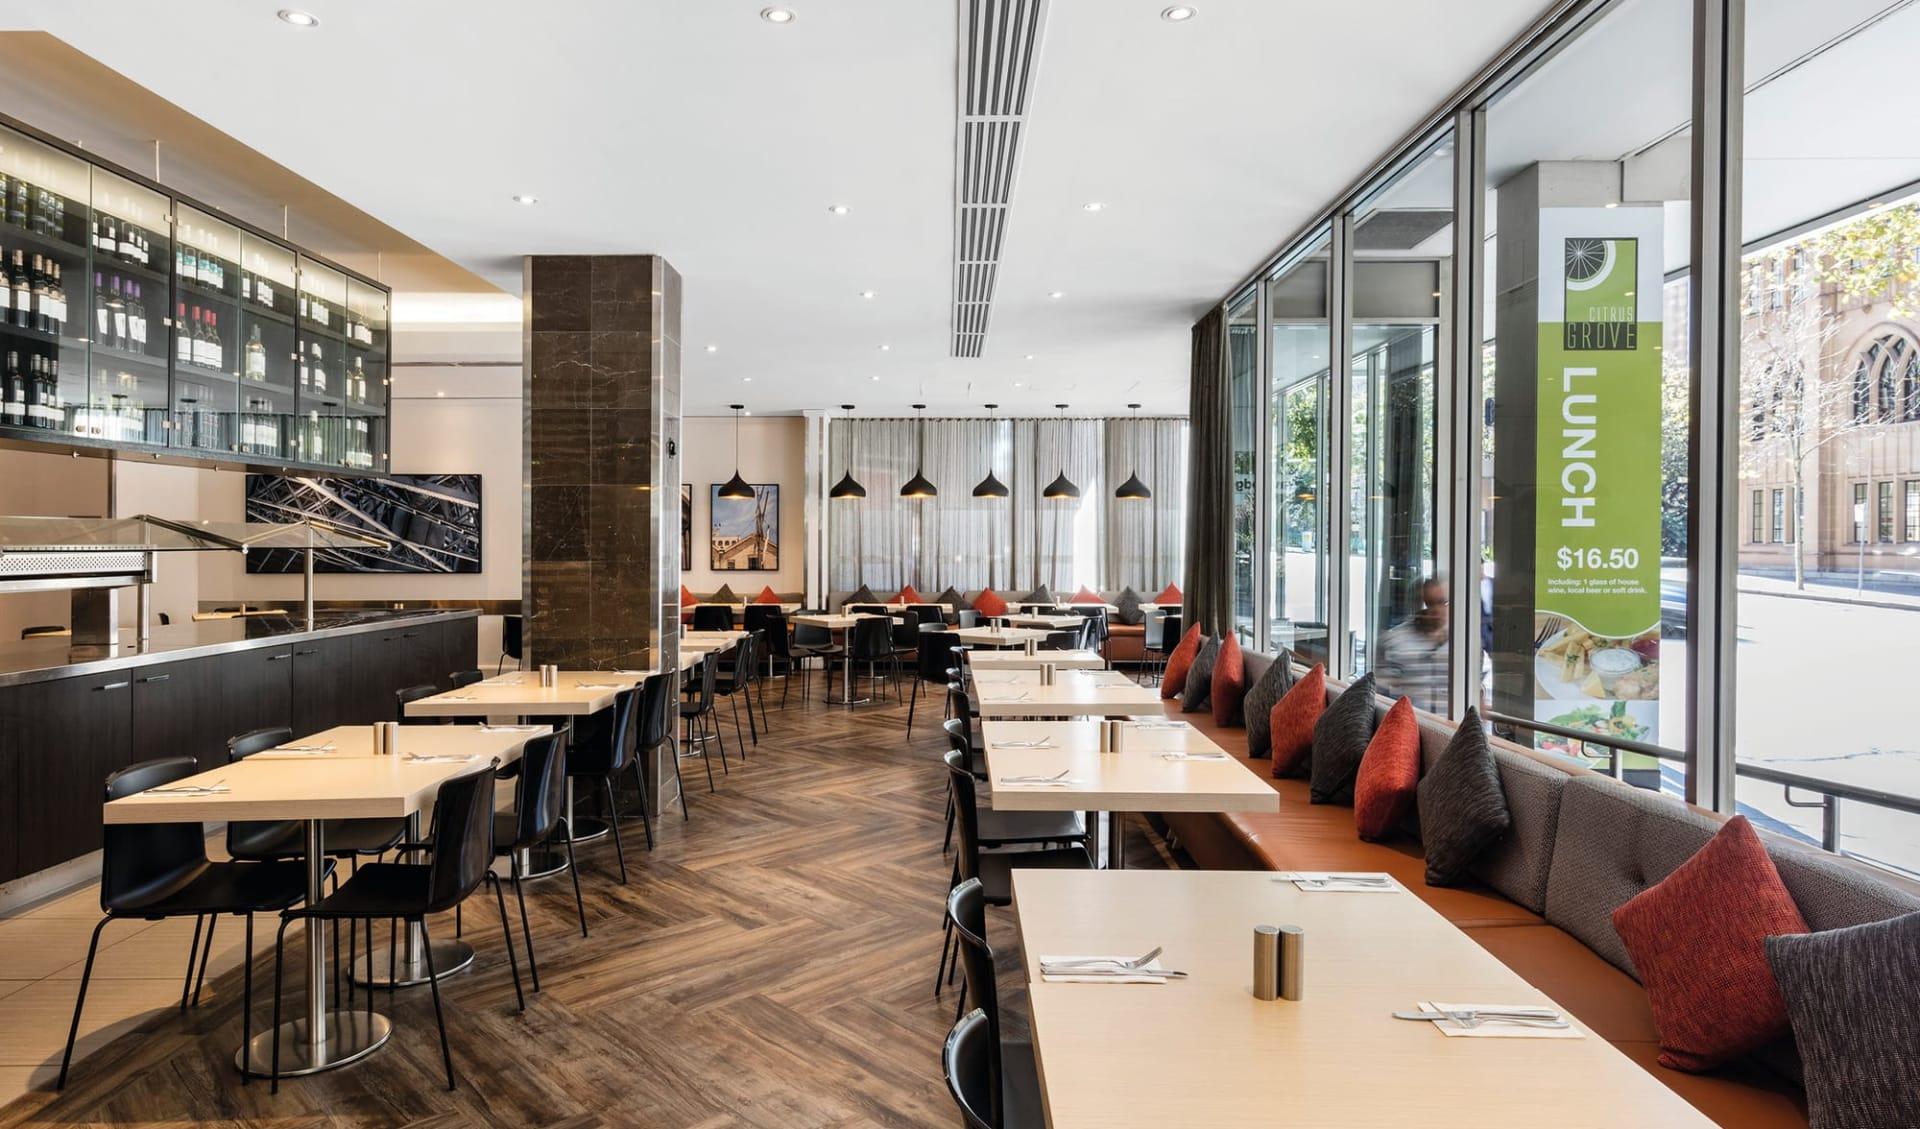 Travelodge Wynyard in Sydney:  Travelodge Wynyard - Hotel-Restaurant Citrus Grove